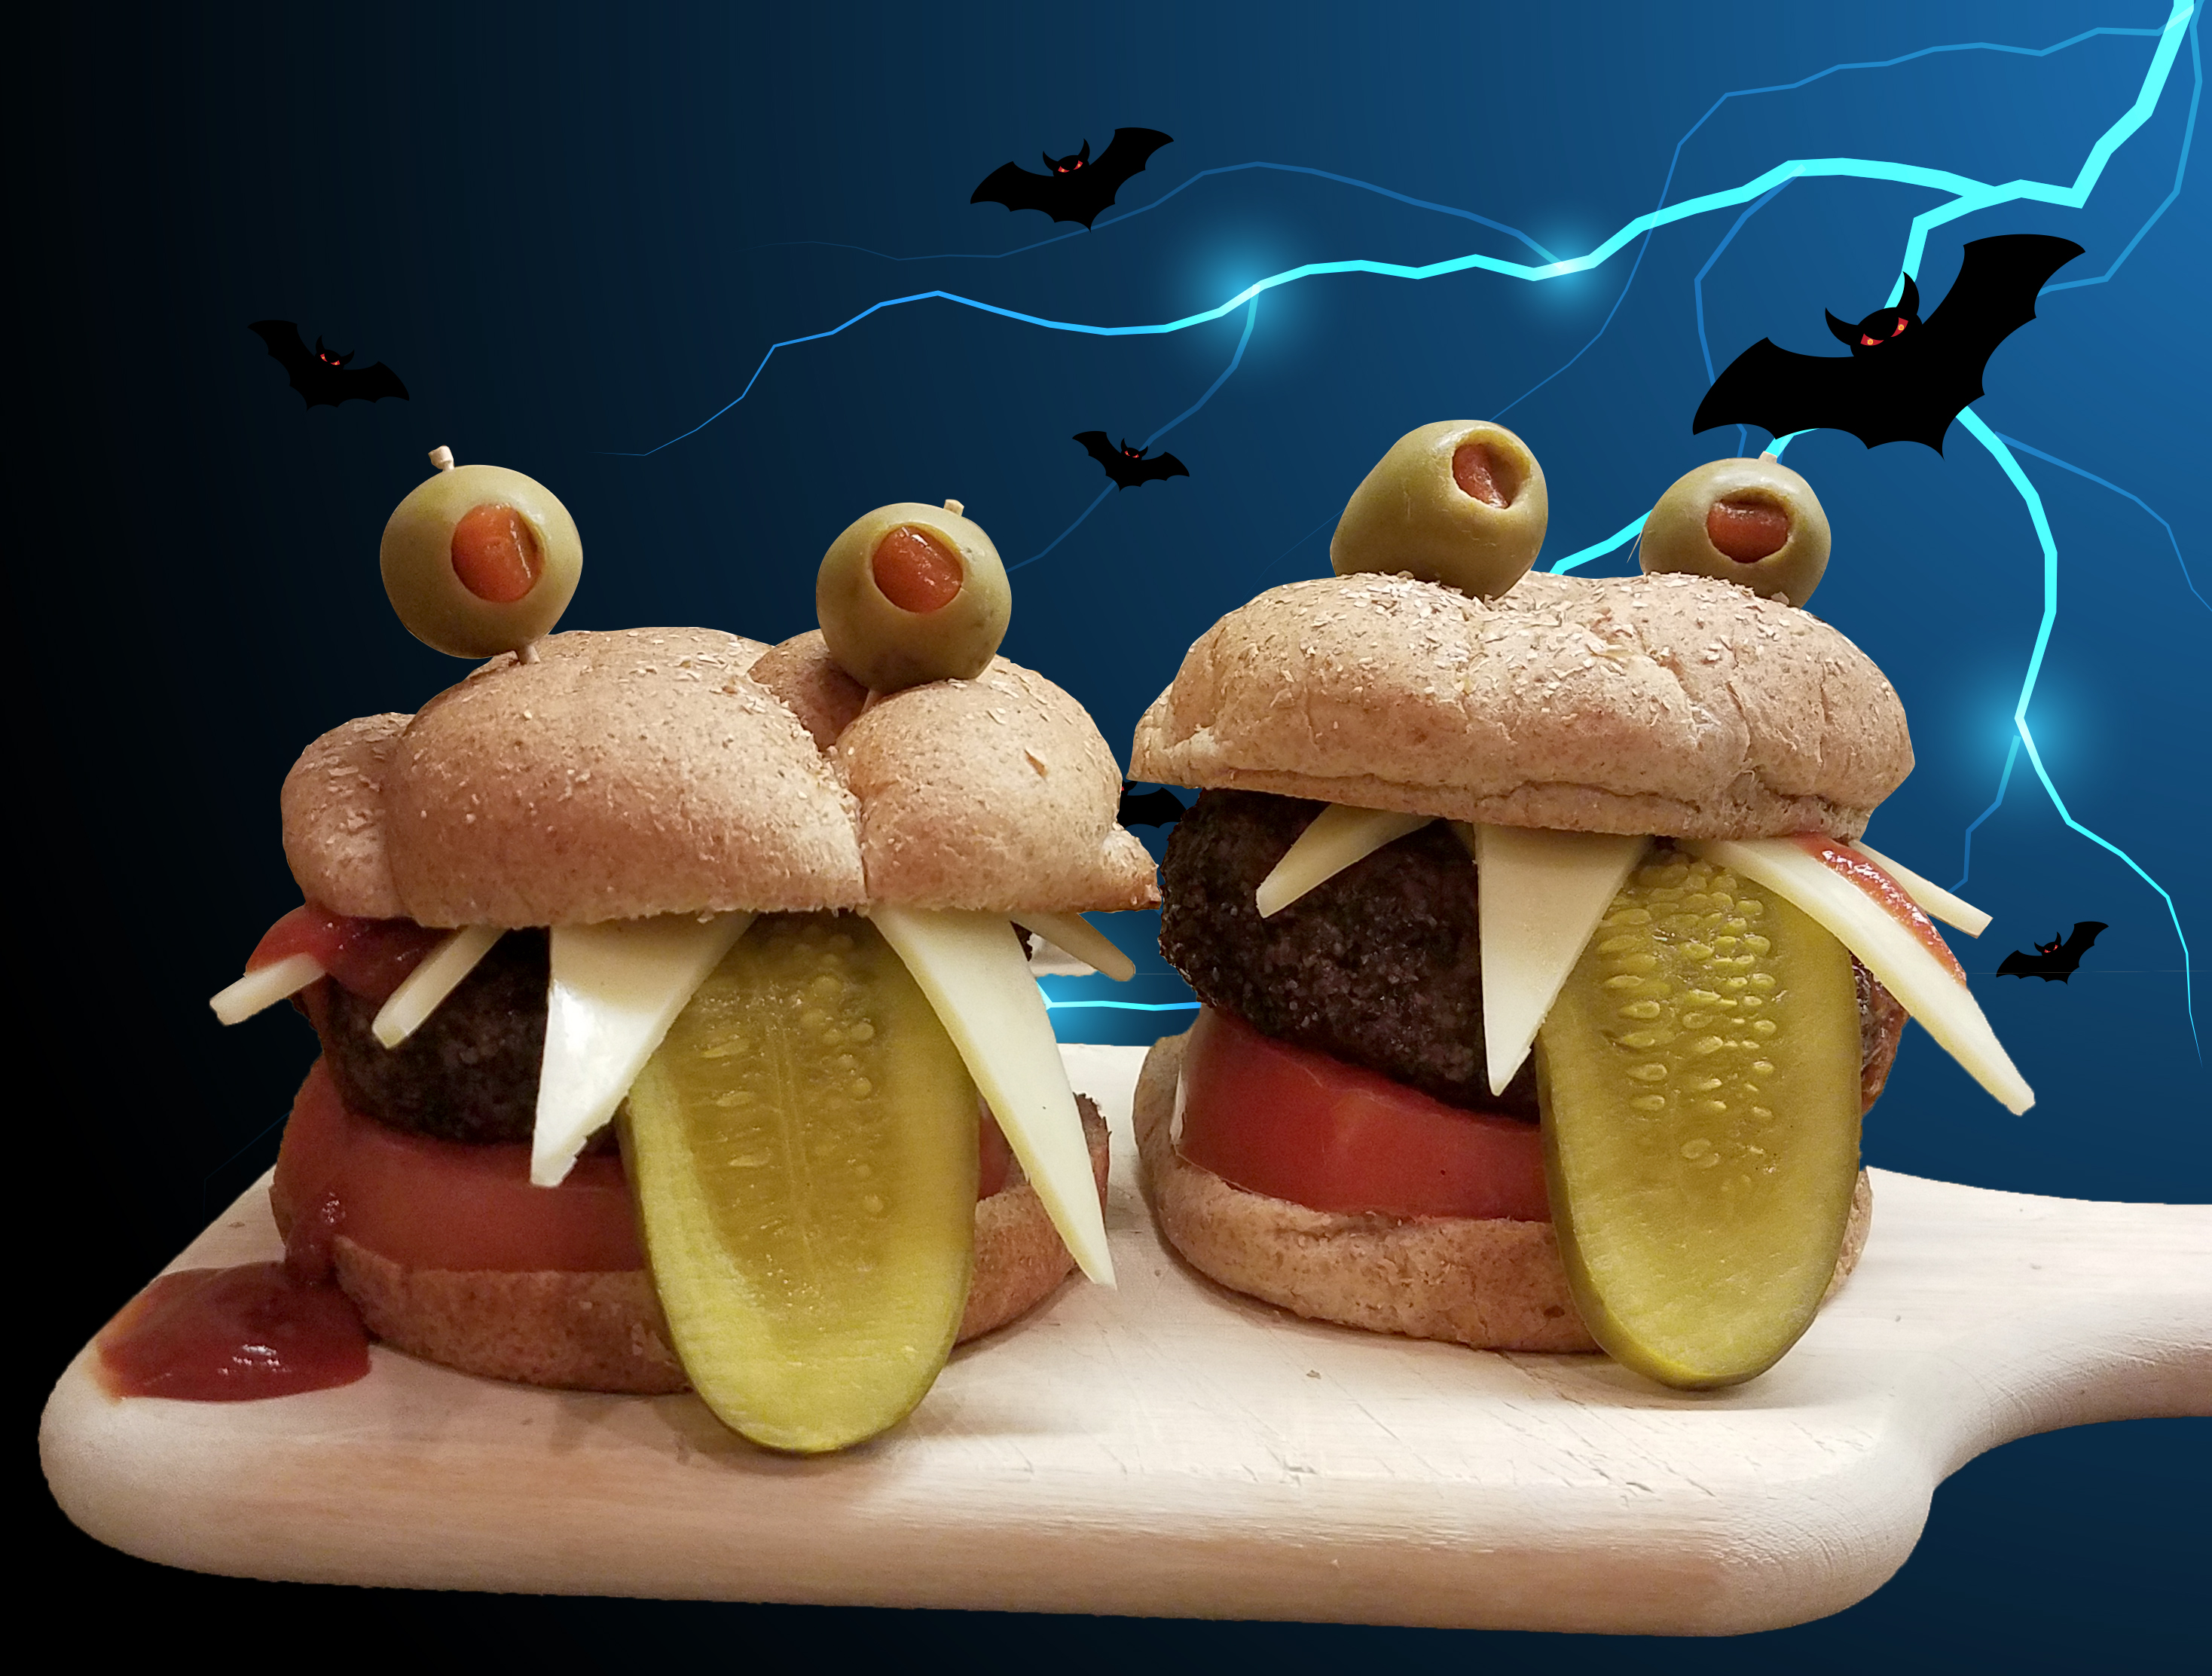 Happy Halloween – Fun with Food!